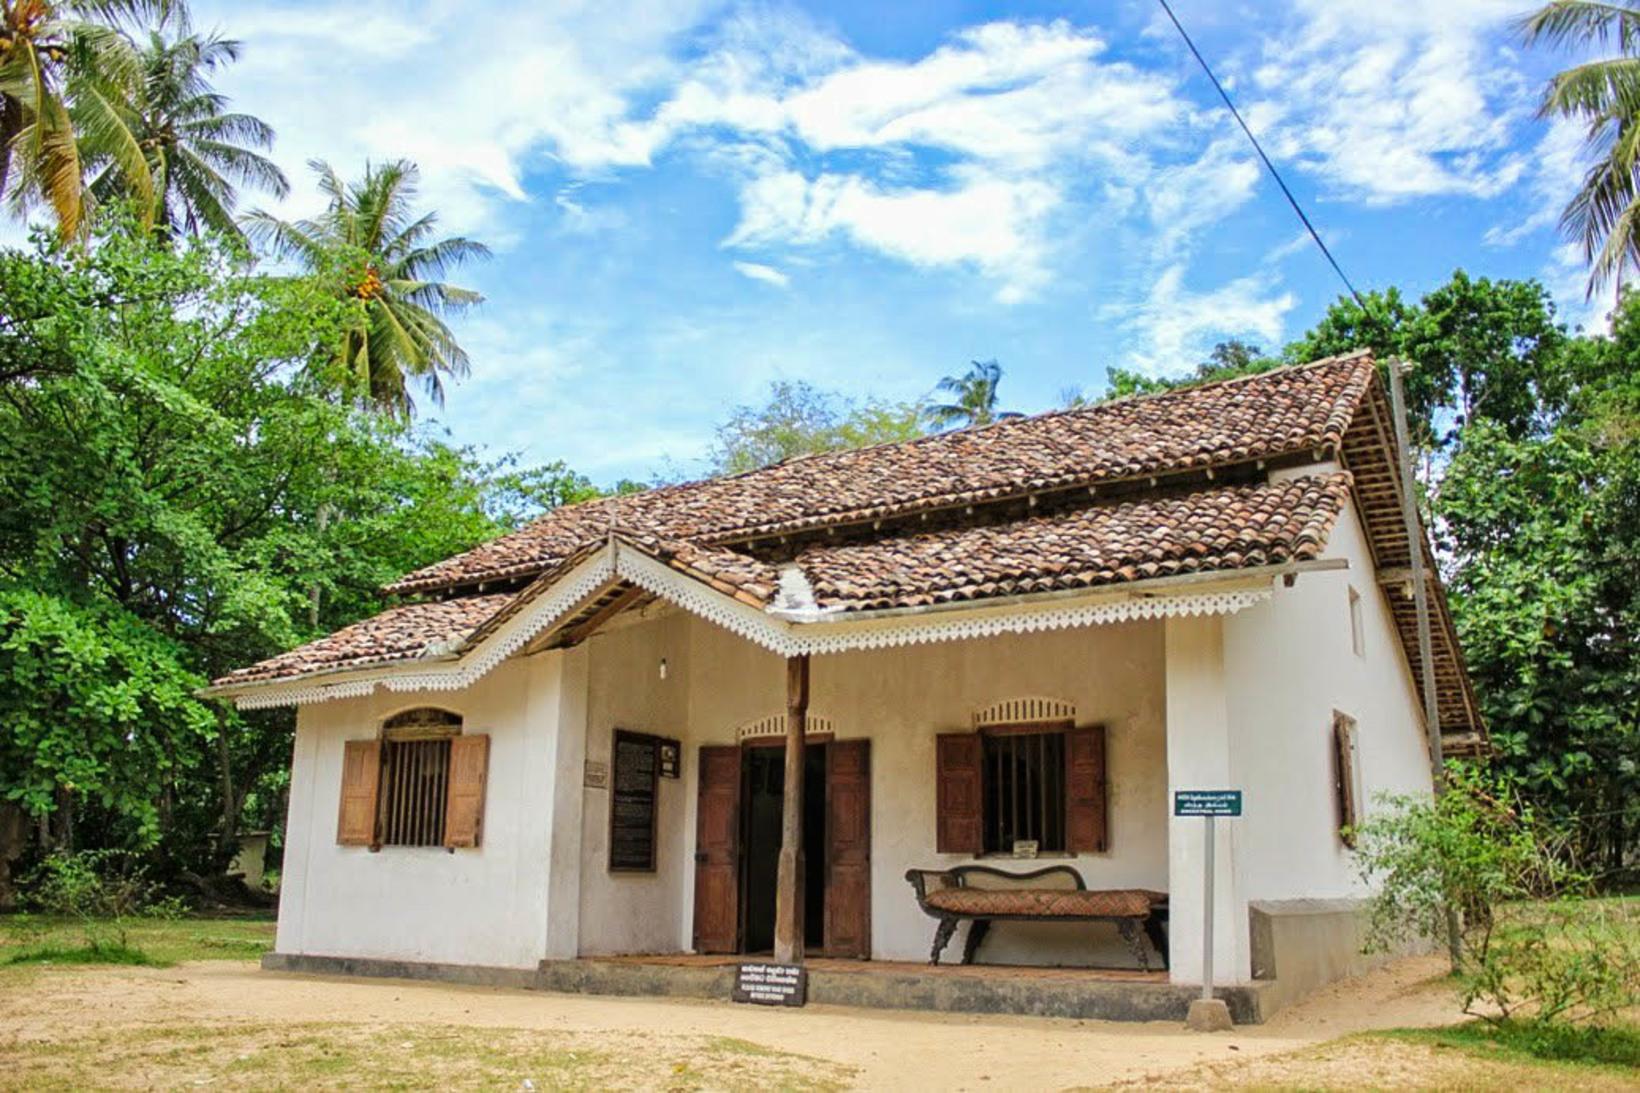 Martin Wickramasinghe Folk Museum Complex, Koggala